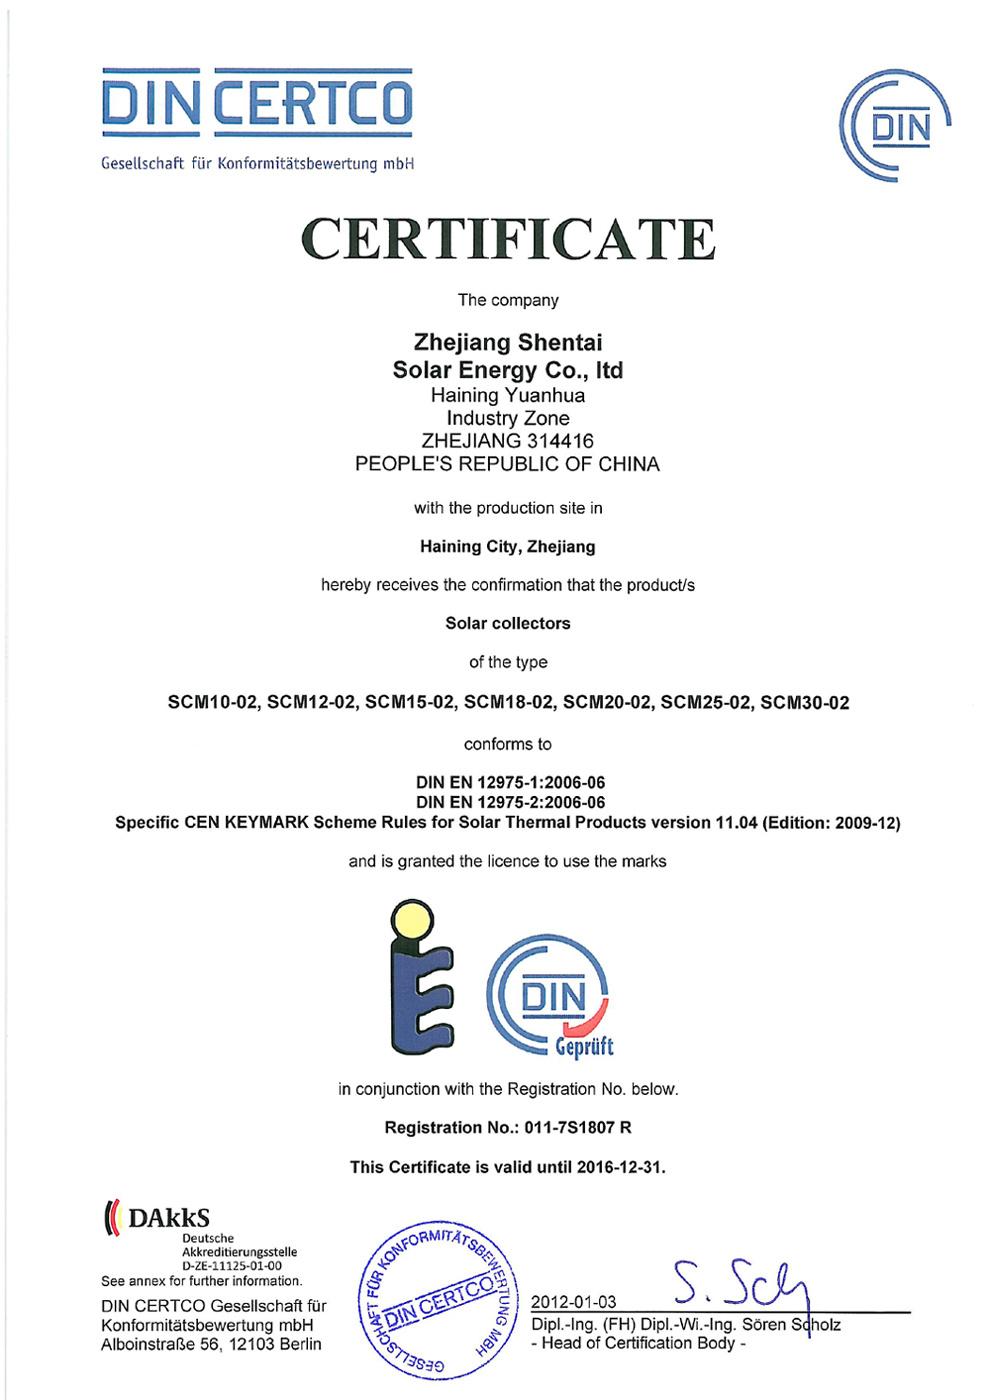 Scm Solar scm 02 solar keymark certificate zhejiang shentai solar energy co